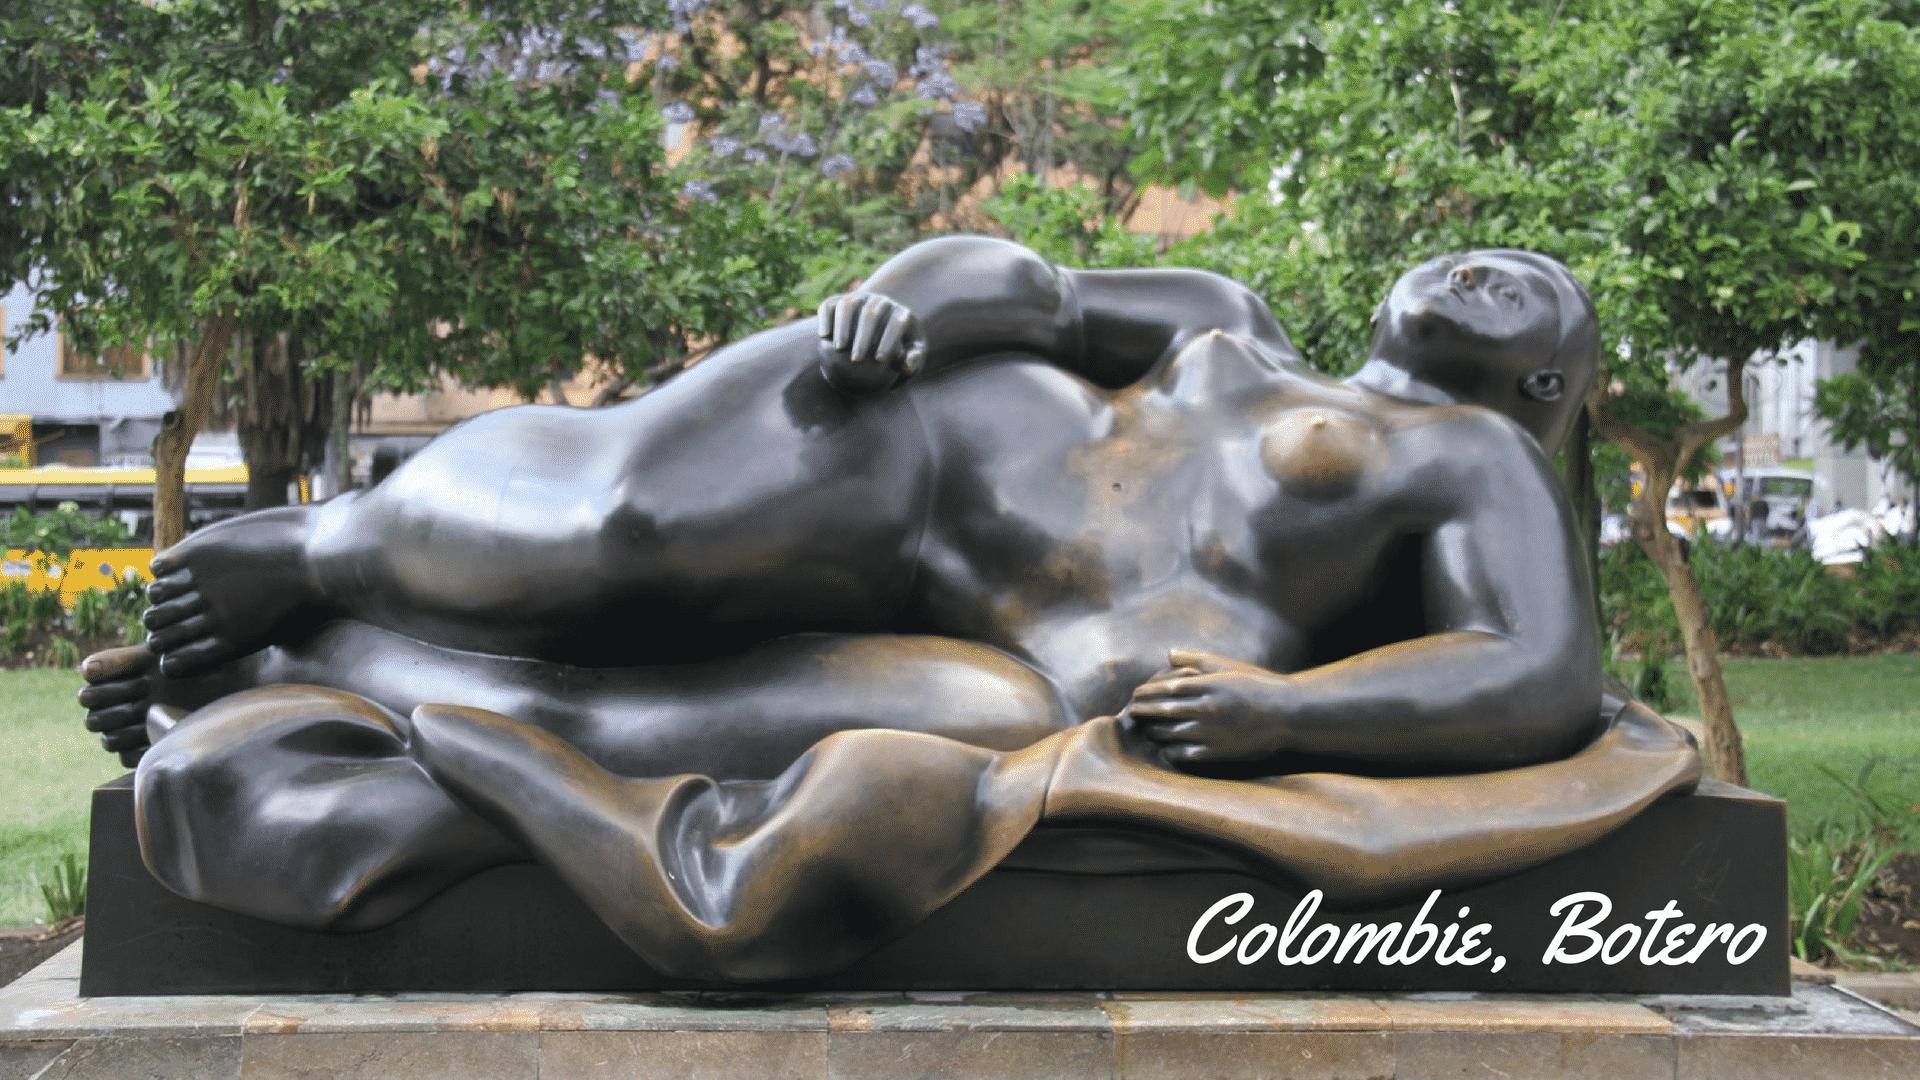 La Colombie De Botero